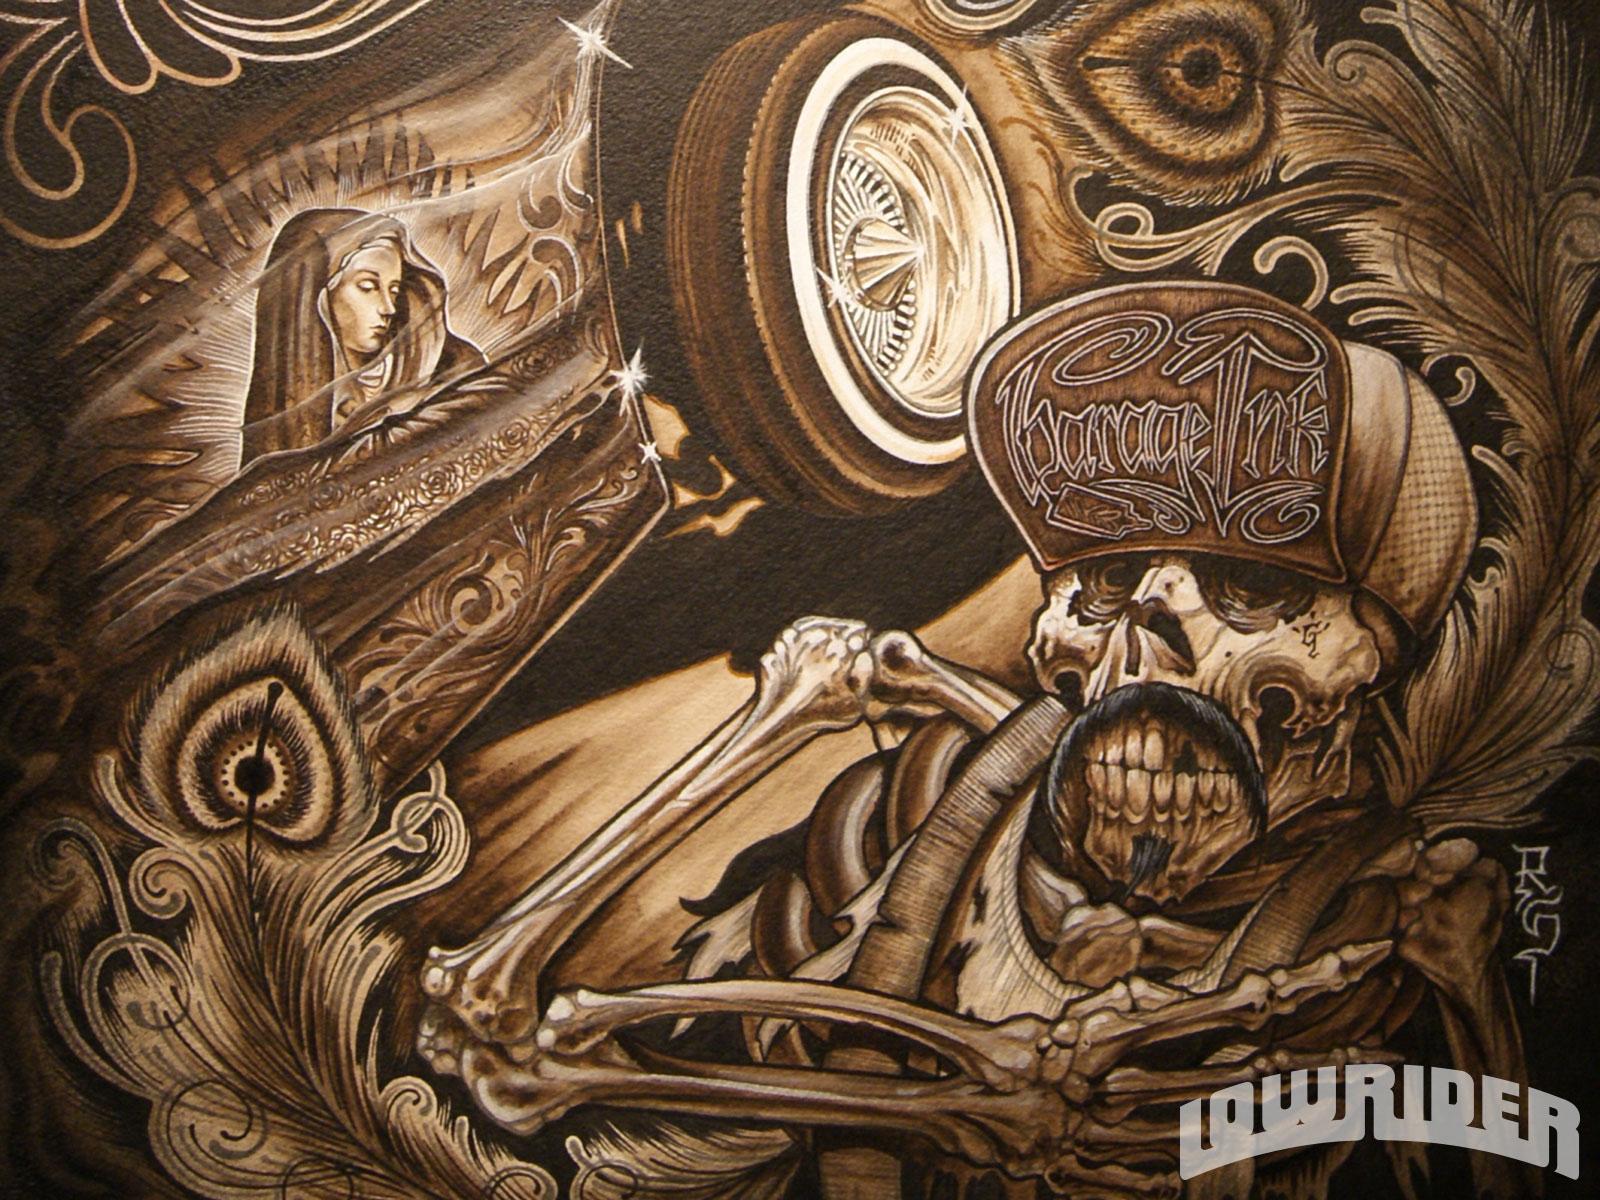 Lowrider Arte Wallpapers on WallpaperSafari